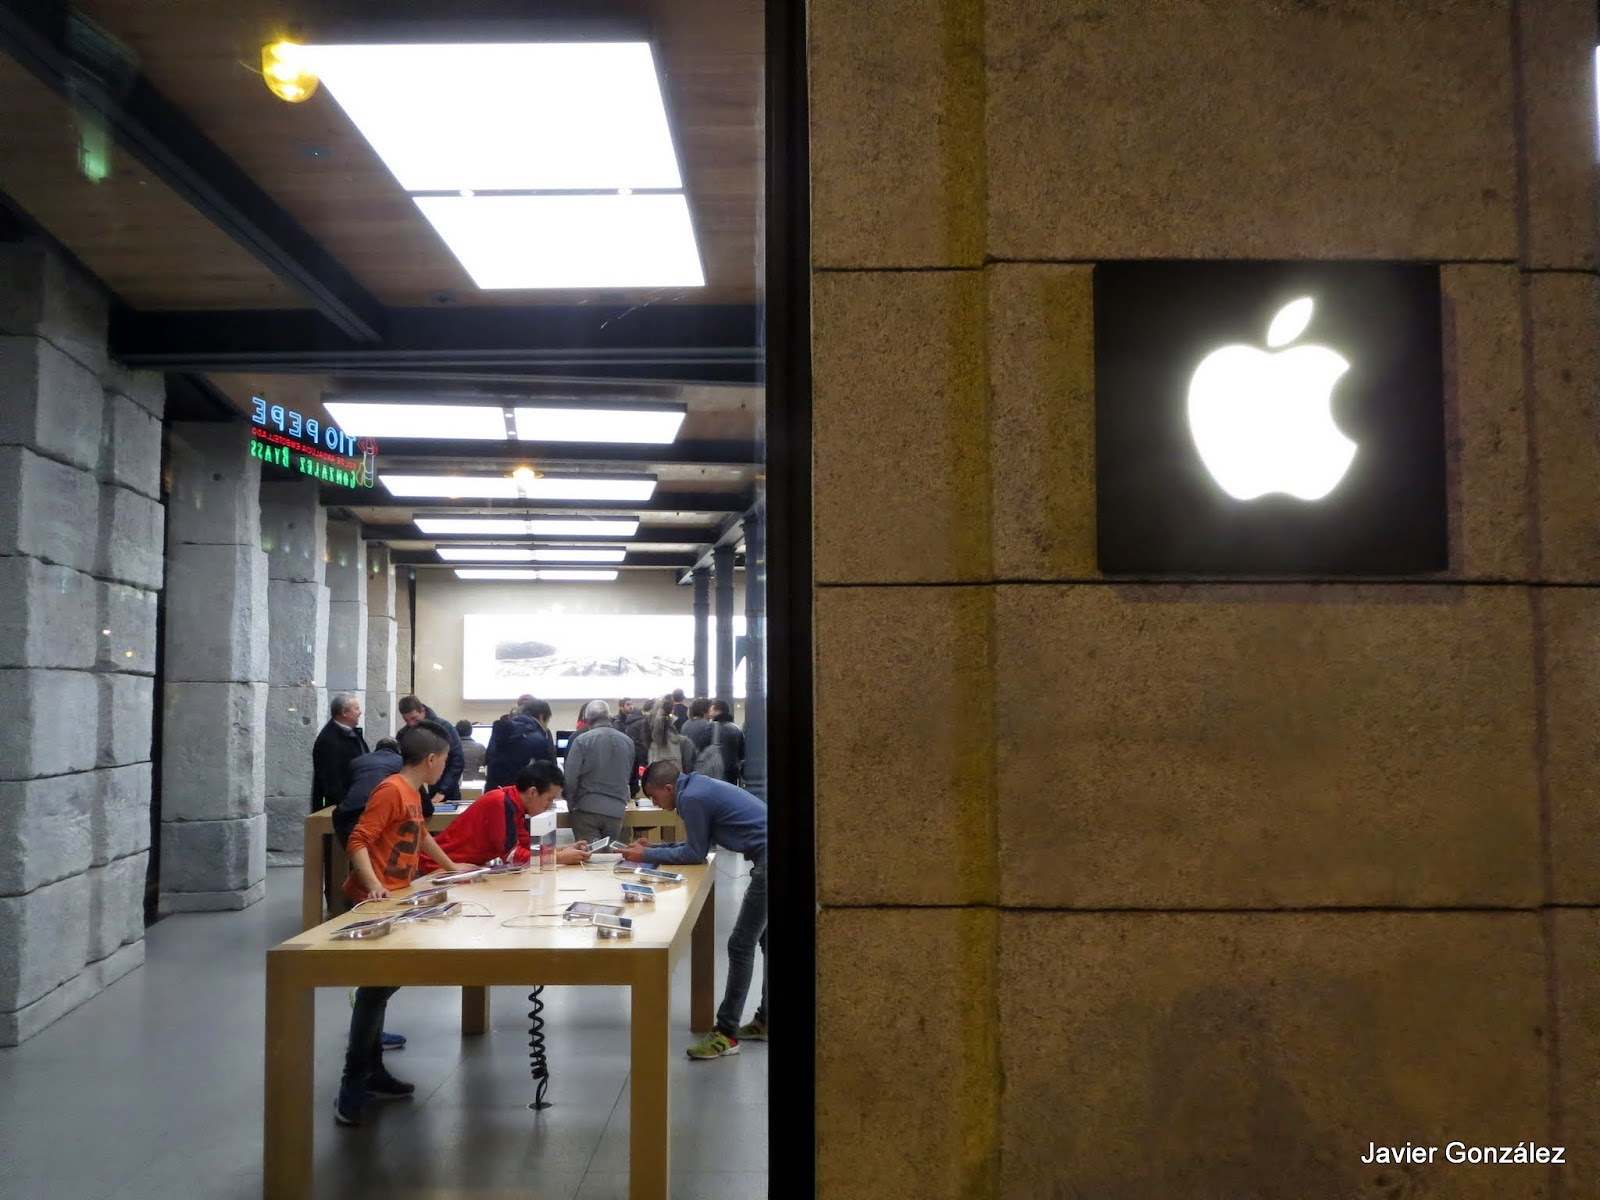 Puerta del Sol. Madrid. Tienda Apple